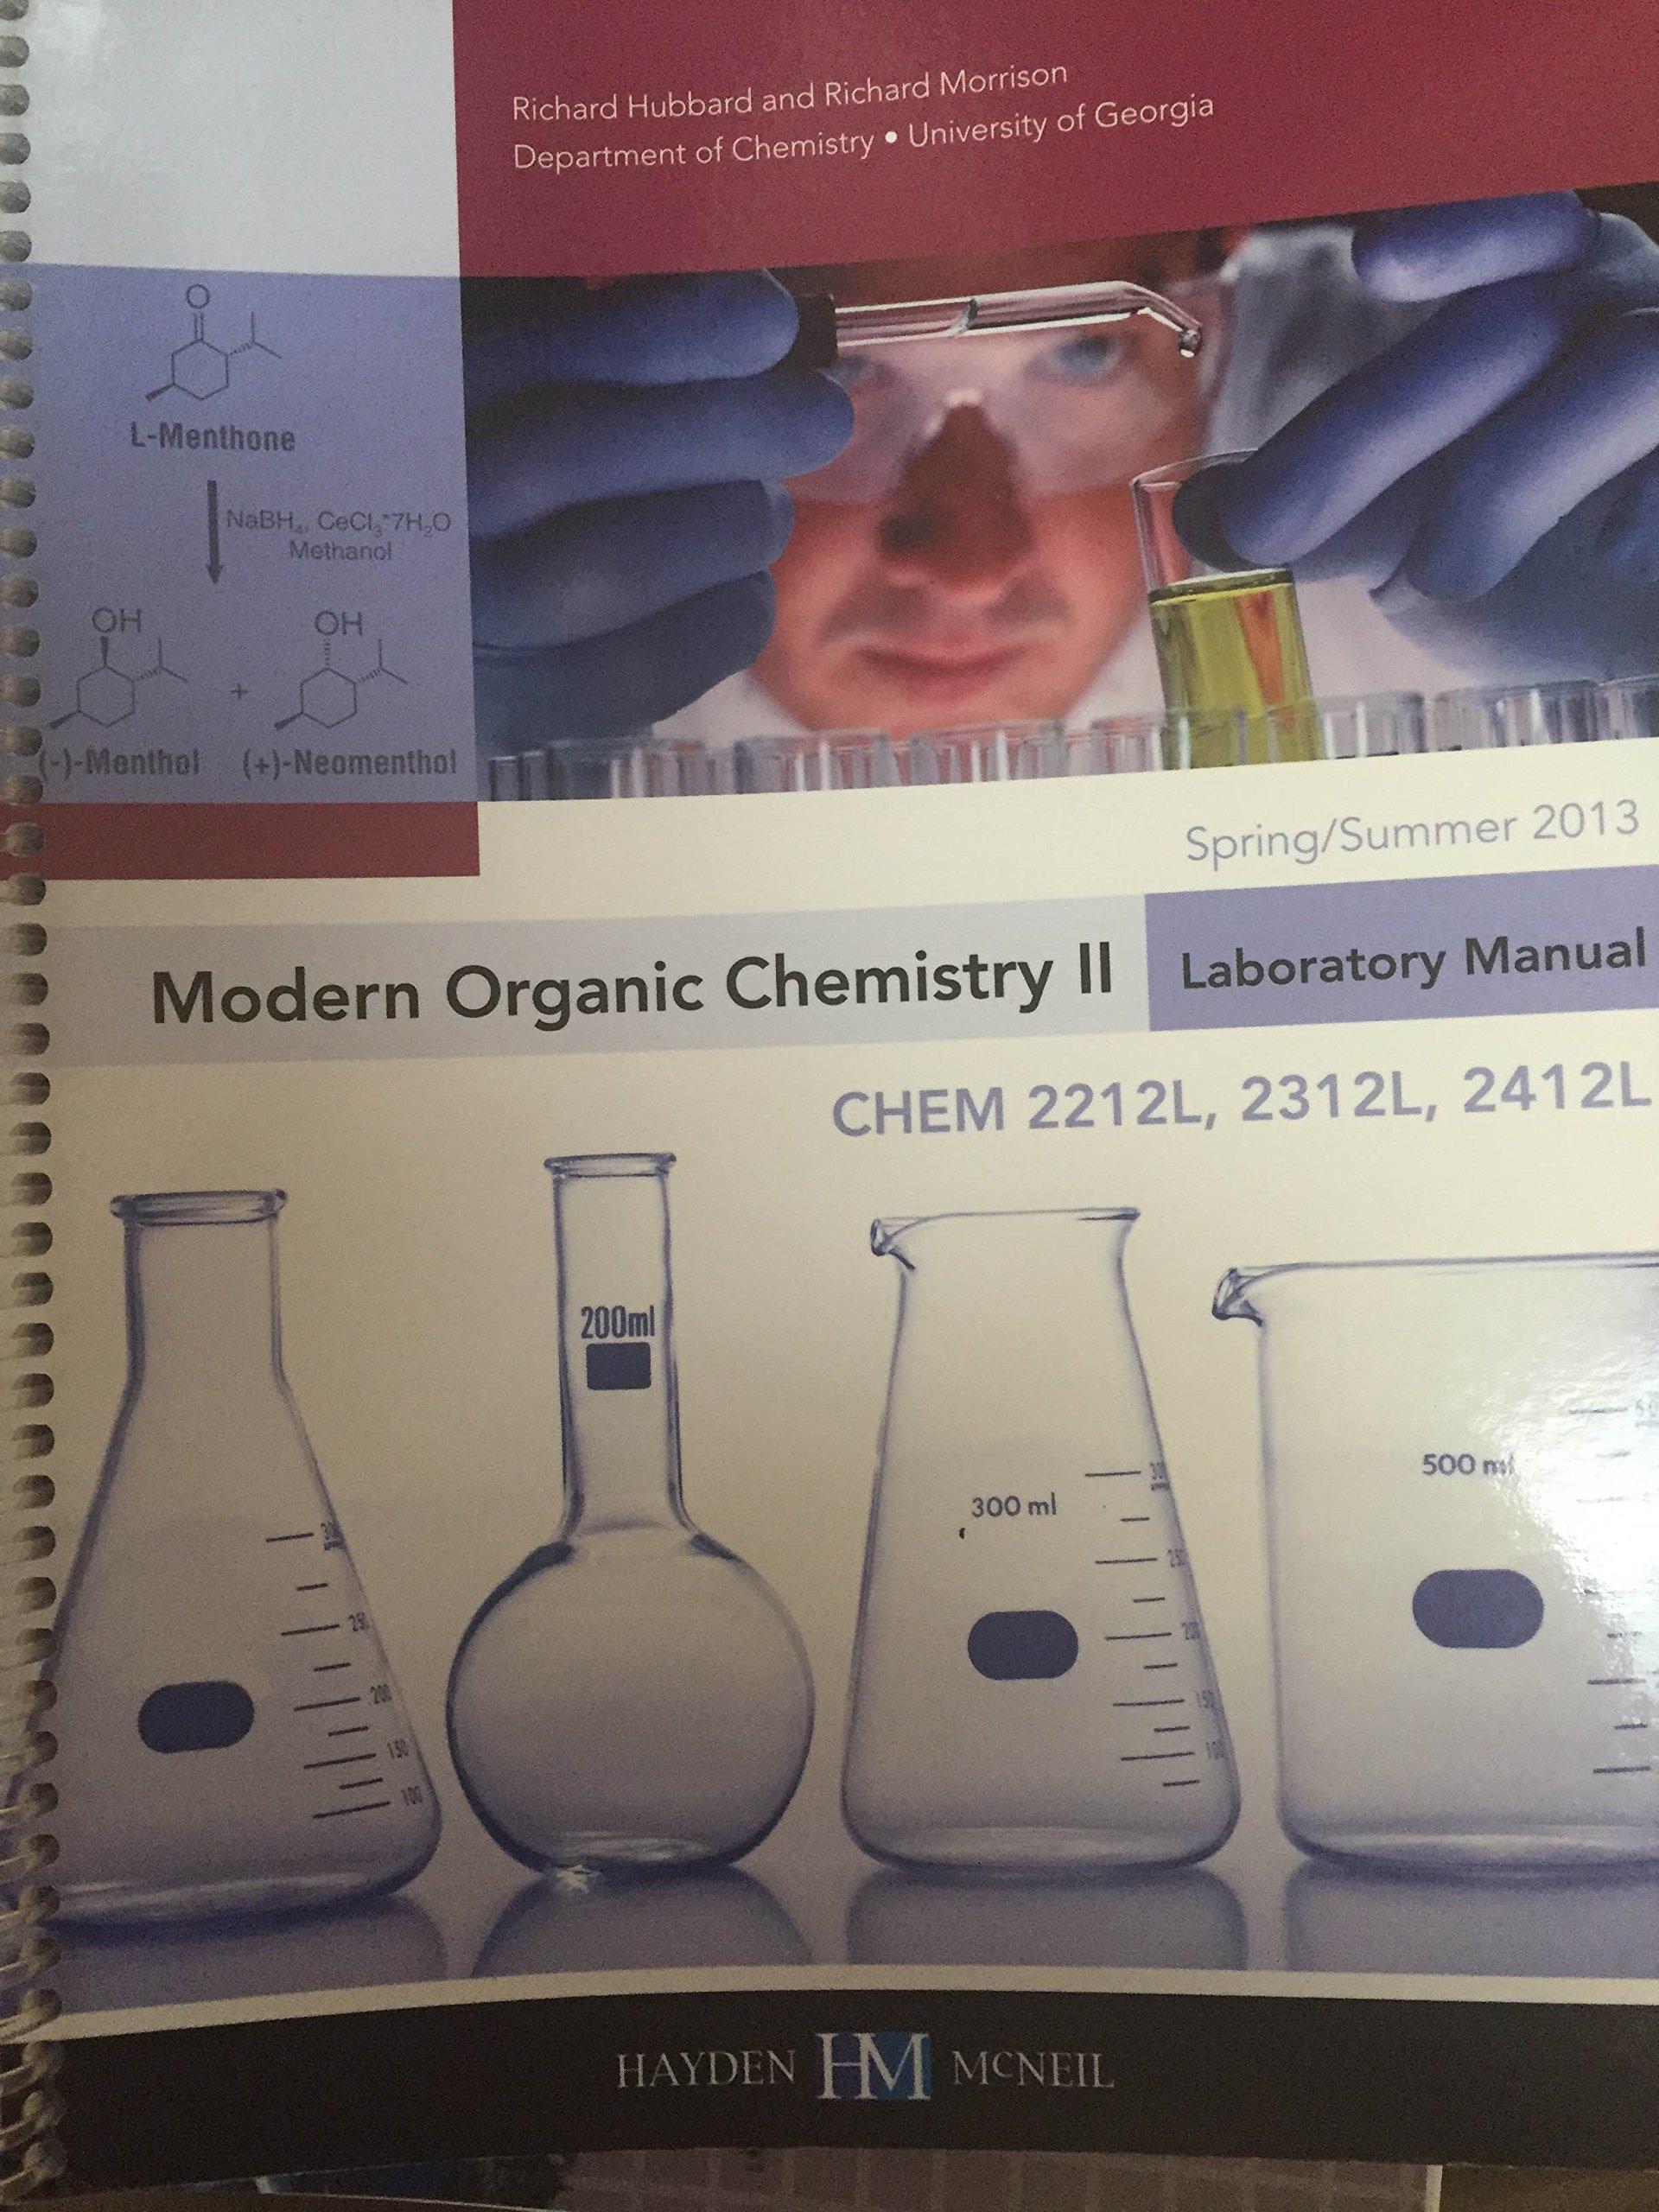 Modern Organic Chemistry II Laboratory Manual: Richard Hubbard